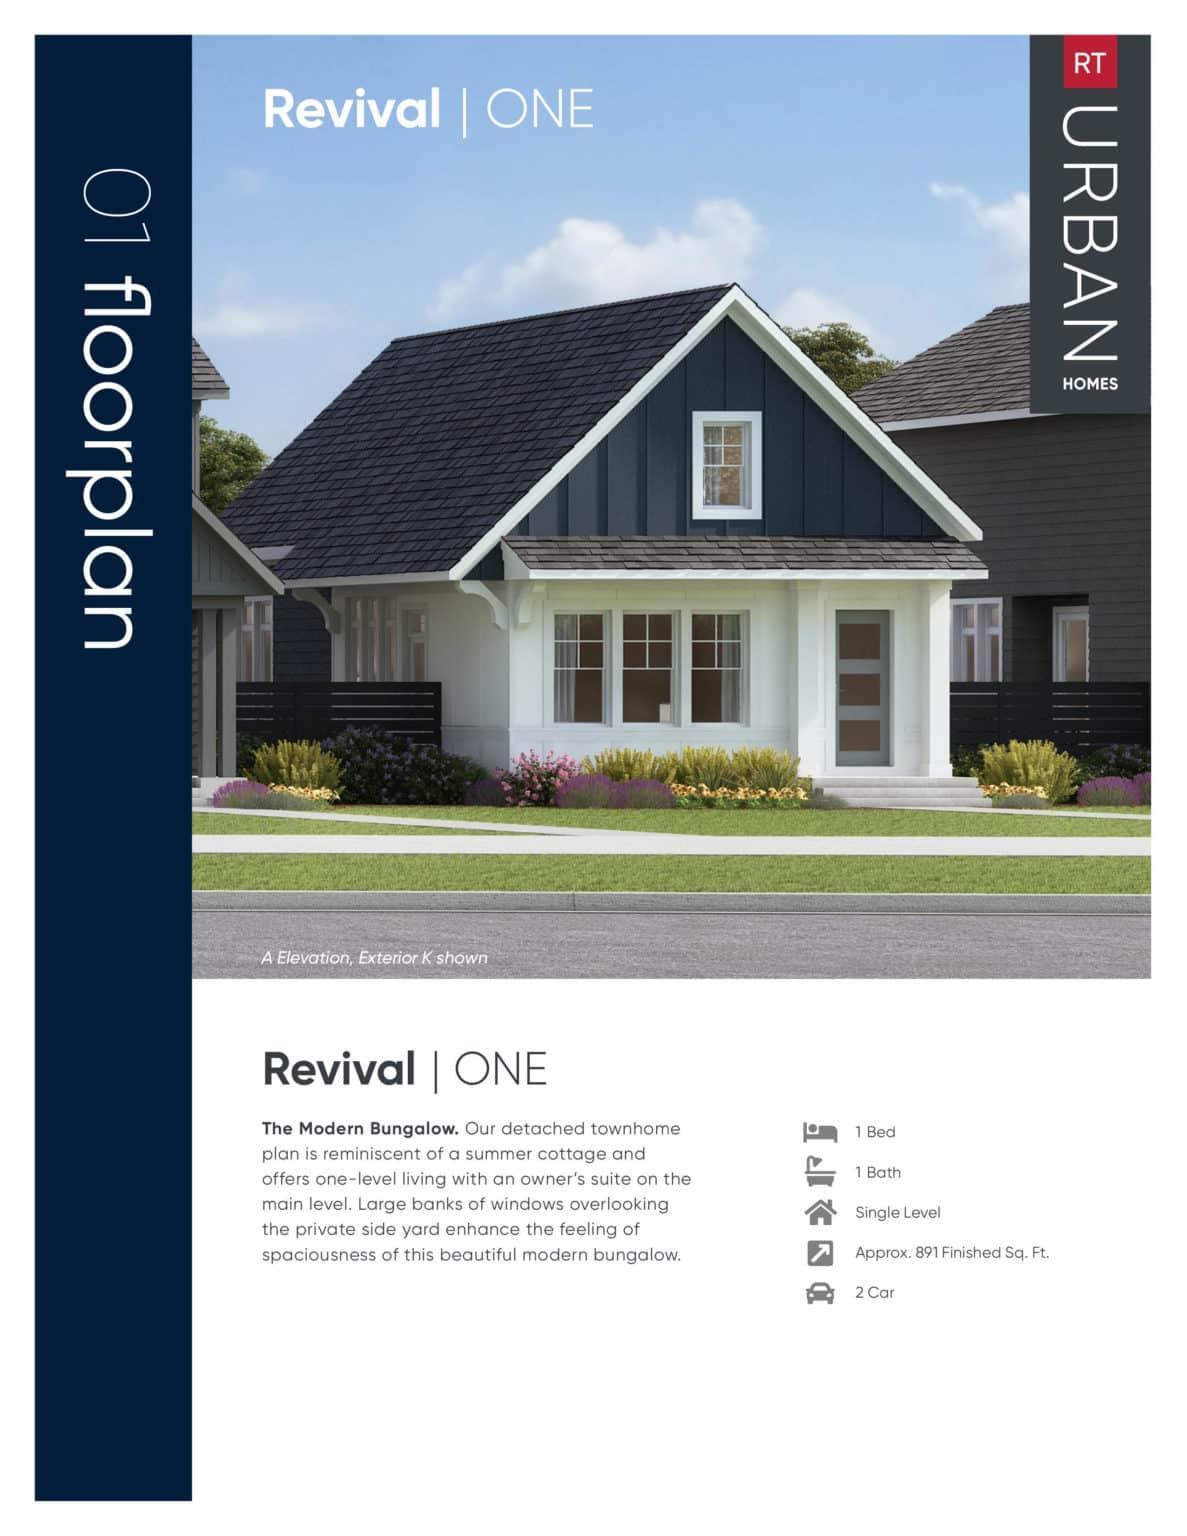 Revival ONE Floorplan Handout_022820_page 1